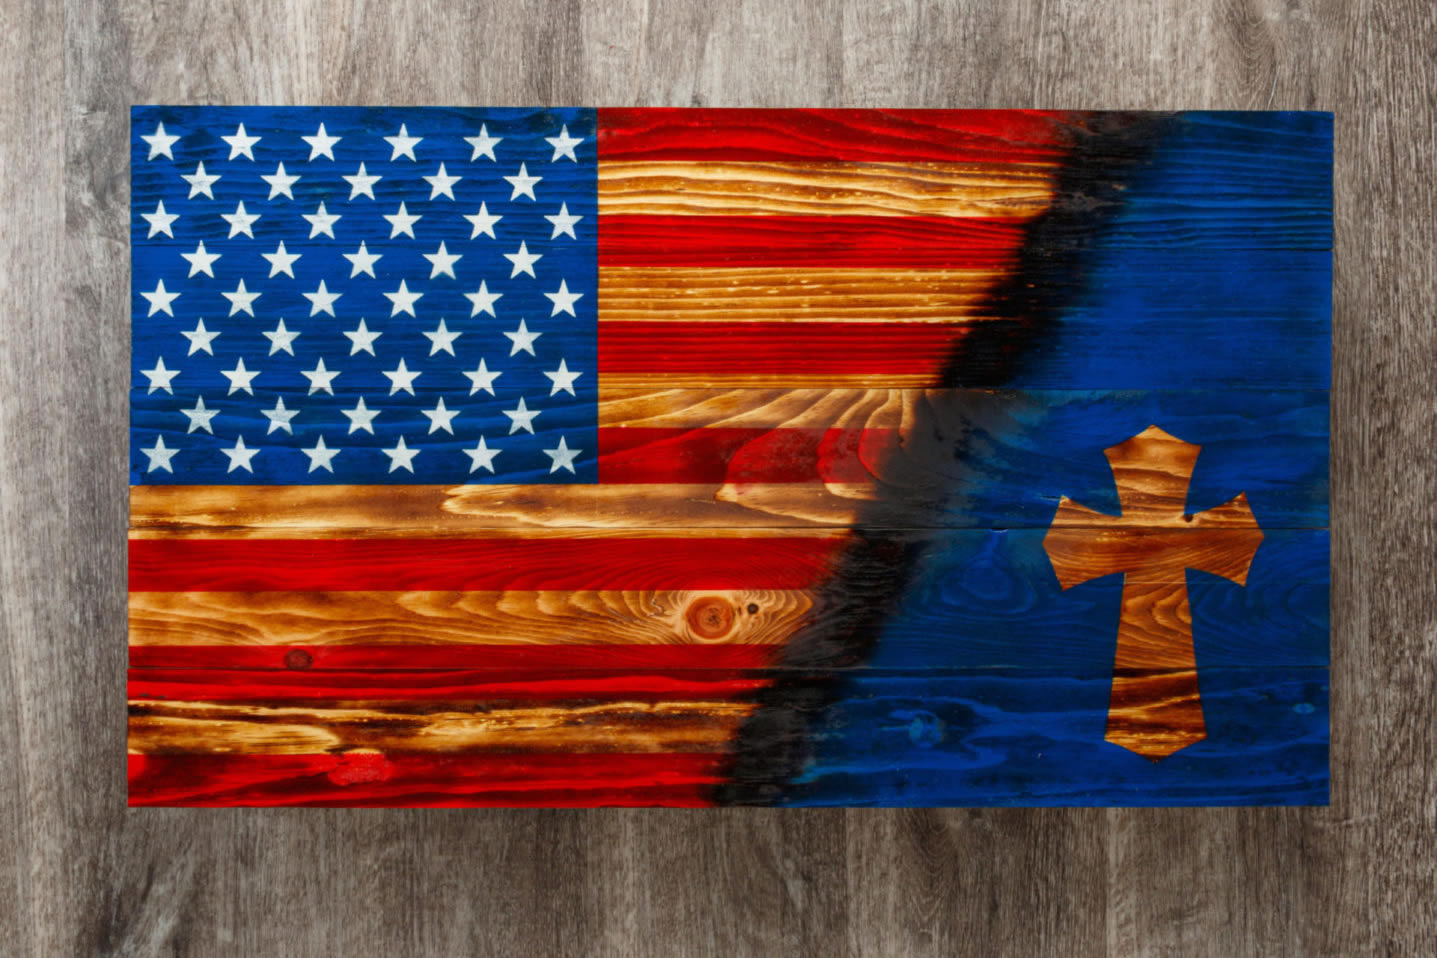 Celtic Cross wooden American flag wall art